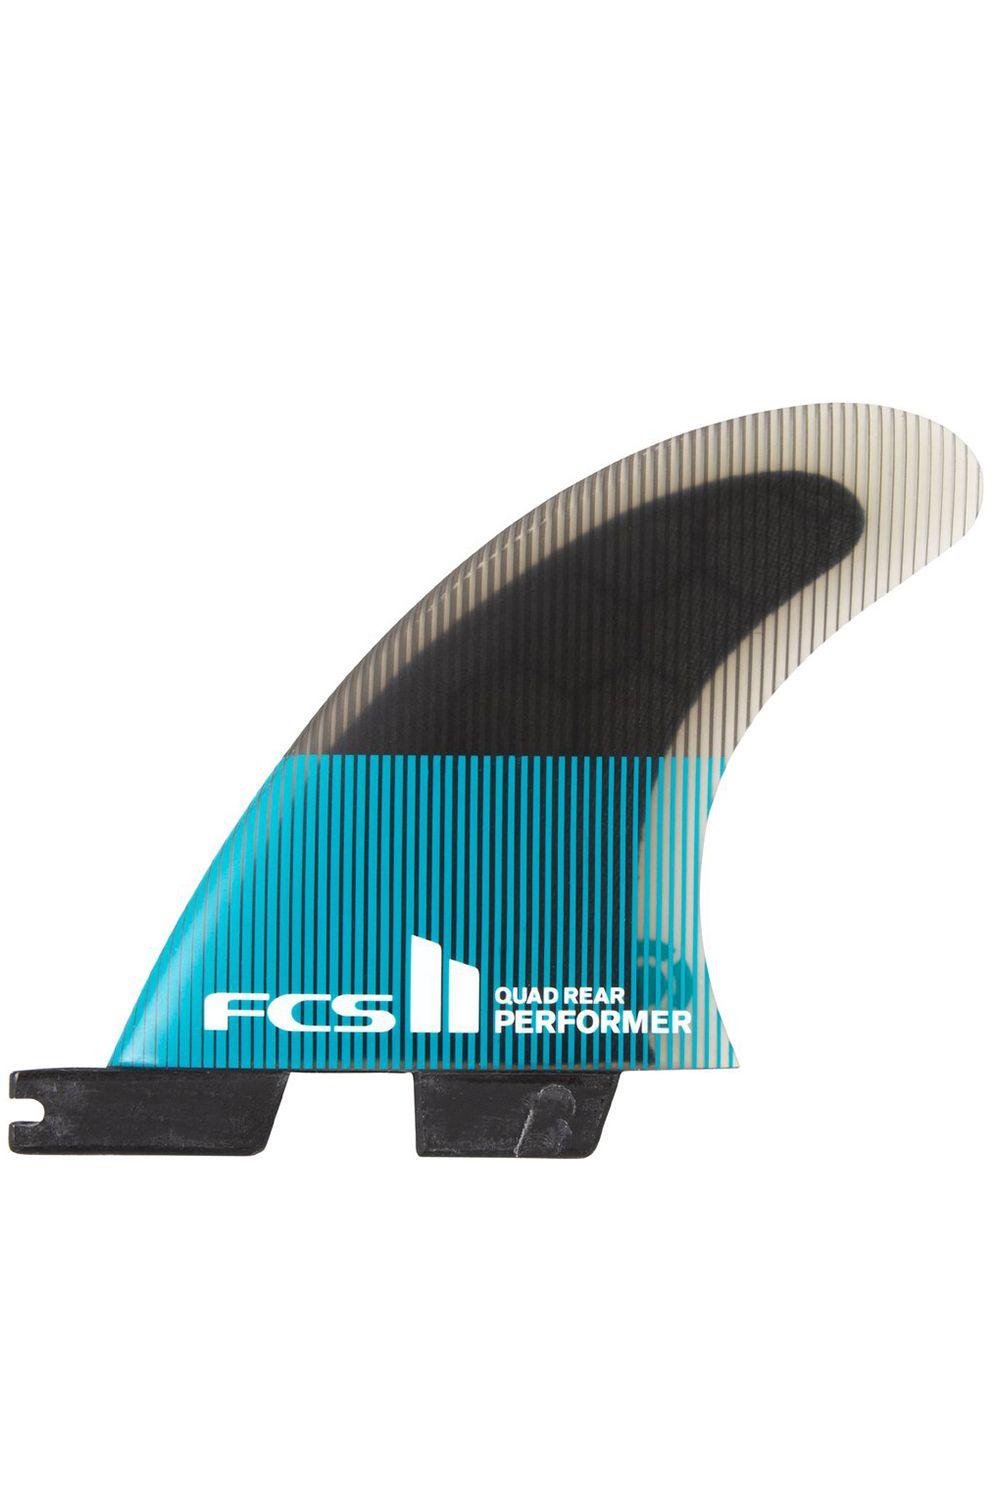 Fcs Fins II PERFORMER PC SMALL TEAL/BLACK QUAD REAR Quad Rear